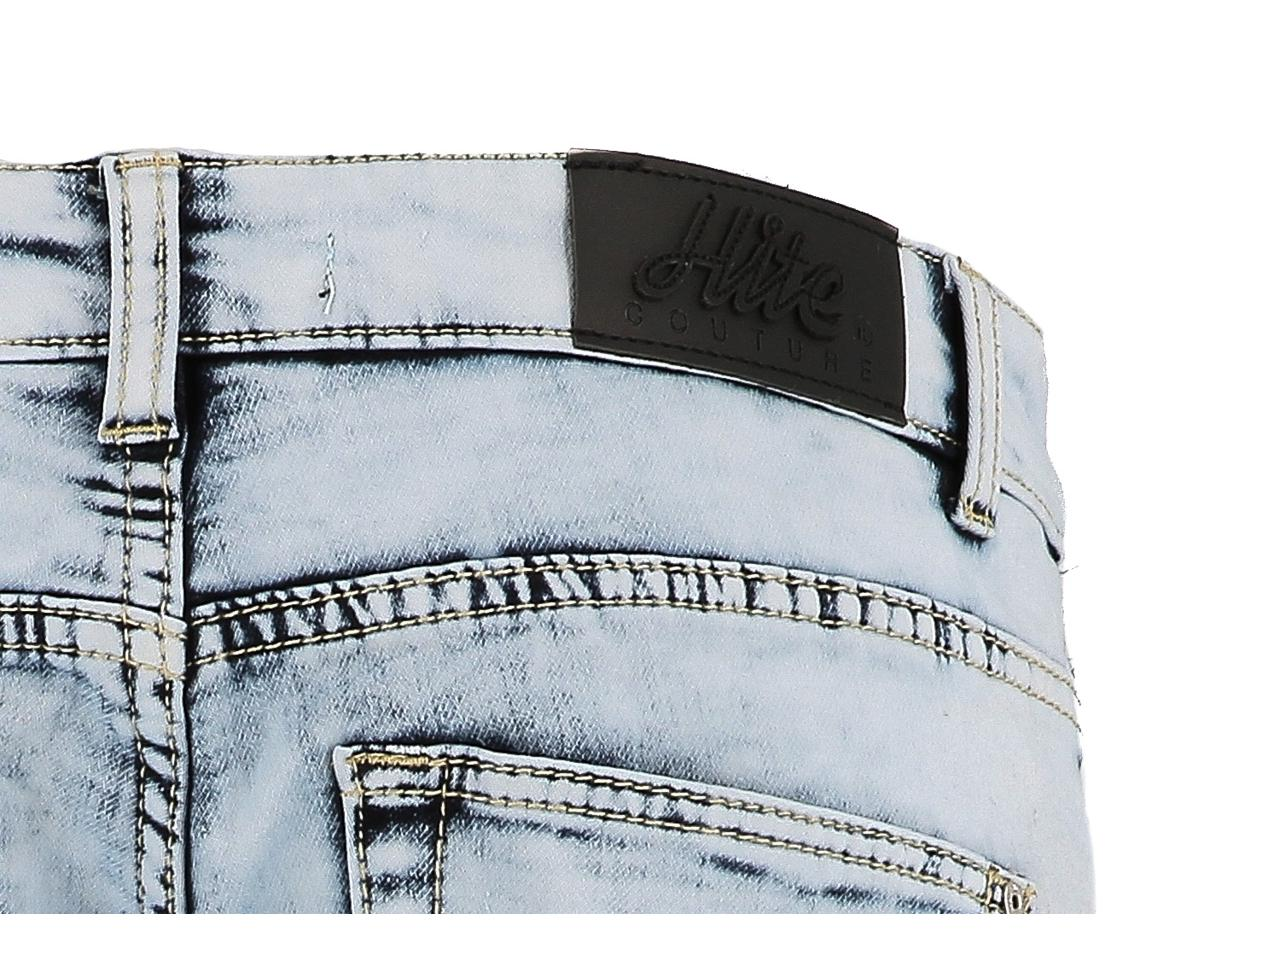 Bermuda-Shorts-Hite-Couture-Spill-Denim-Blue-Bermuda-Blue-11588-New thumbnail 4